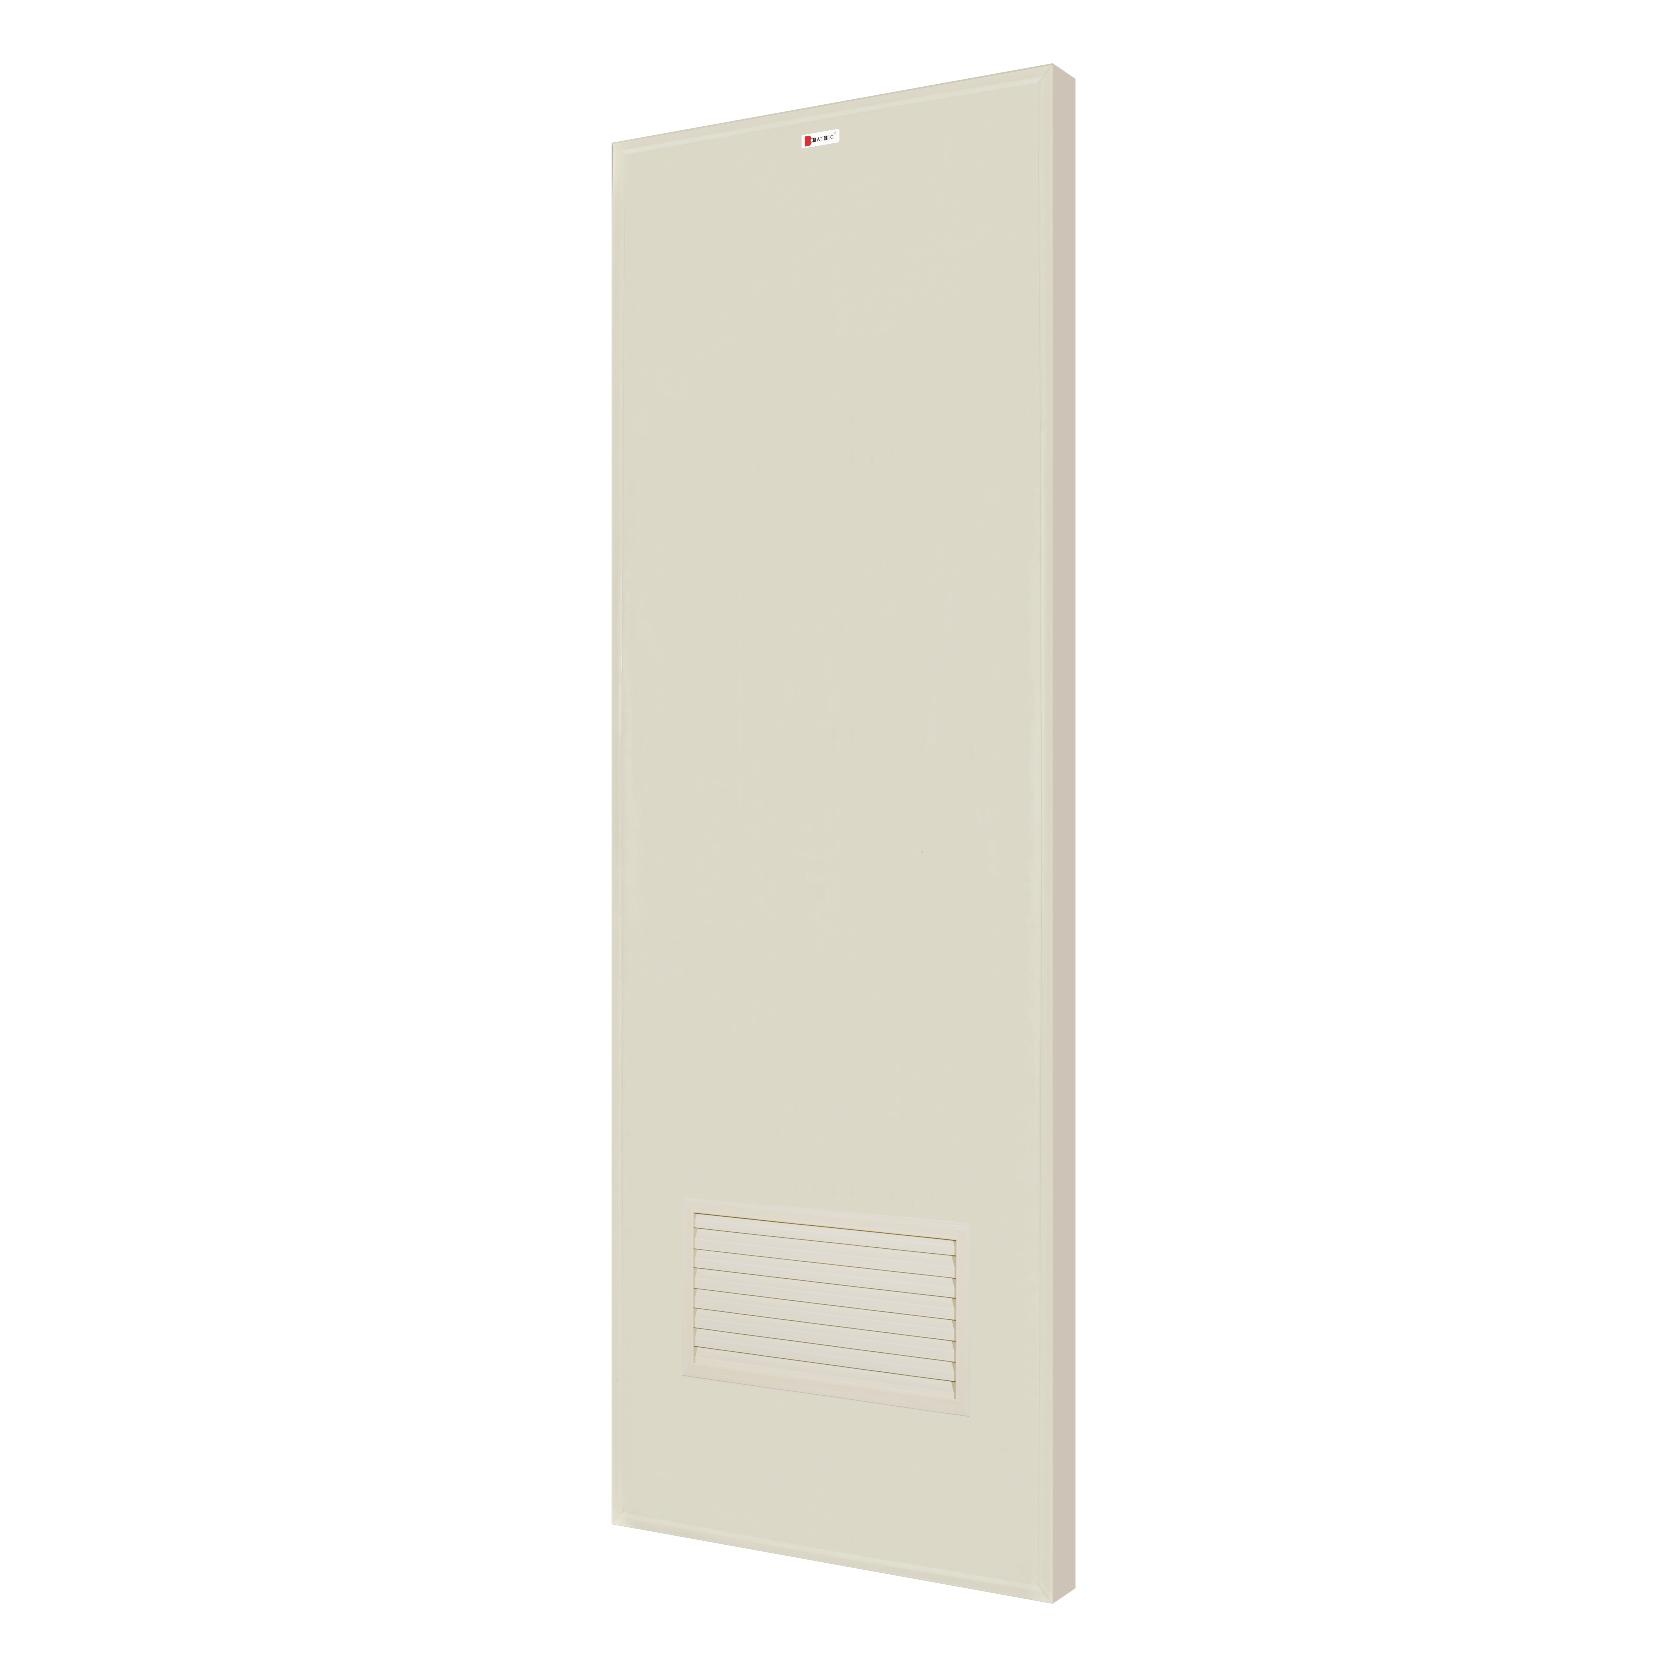 door-pvc-bathic-bpc2-cream-2